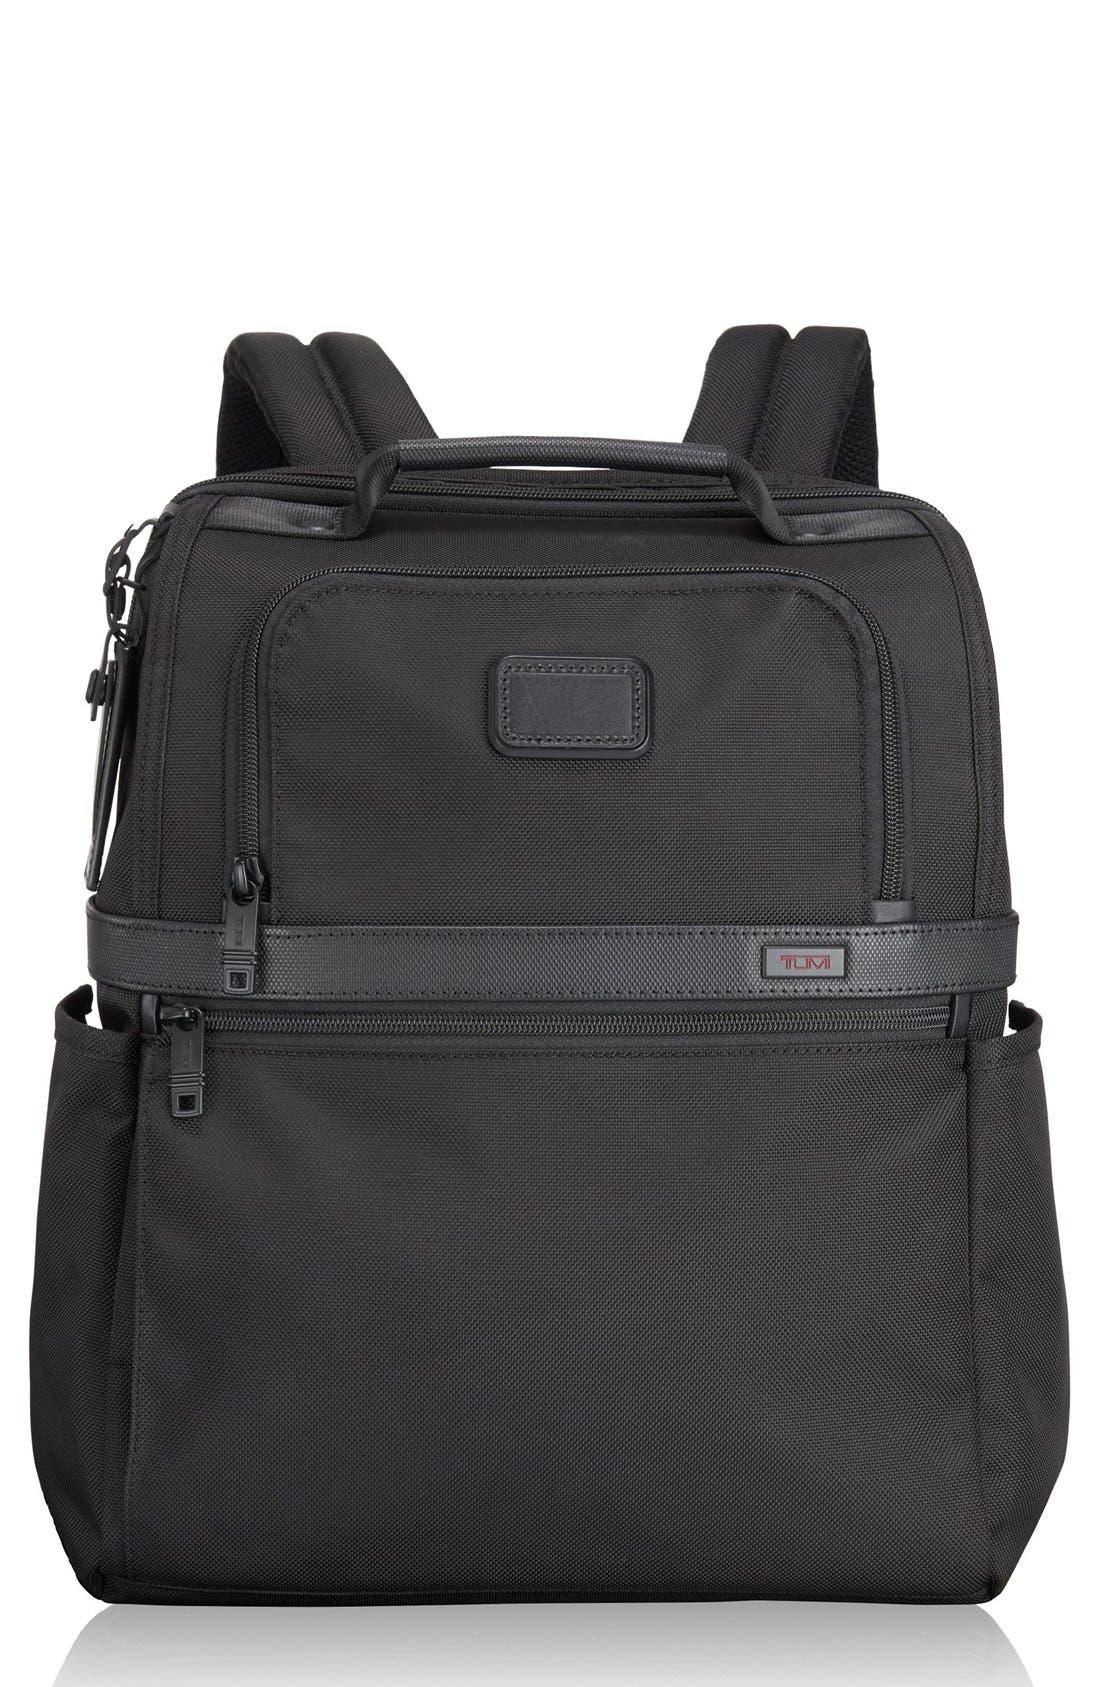 Main Image - Tumi Slim Solutions Briefpack